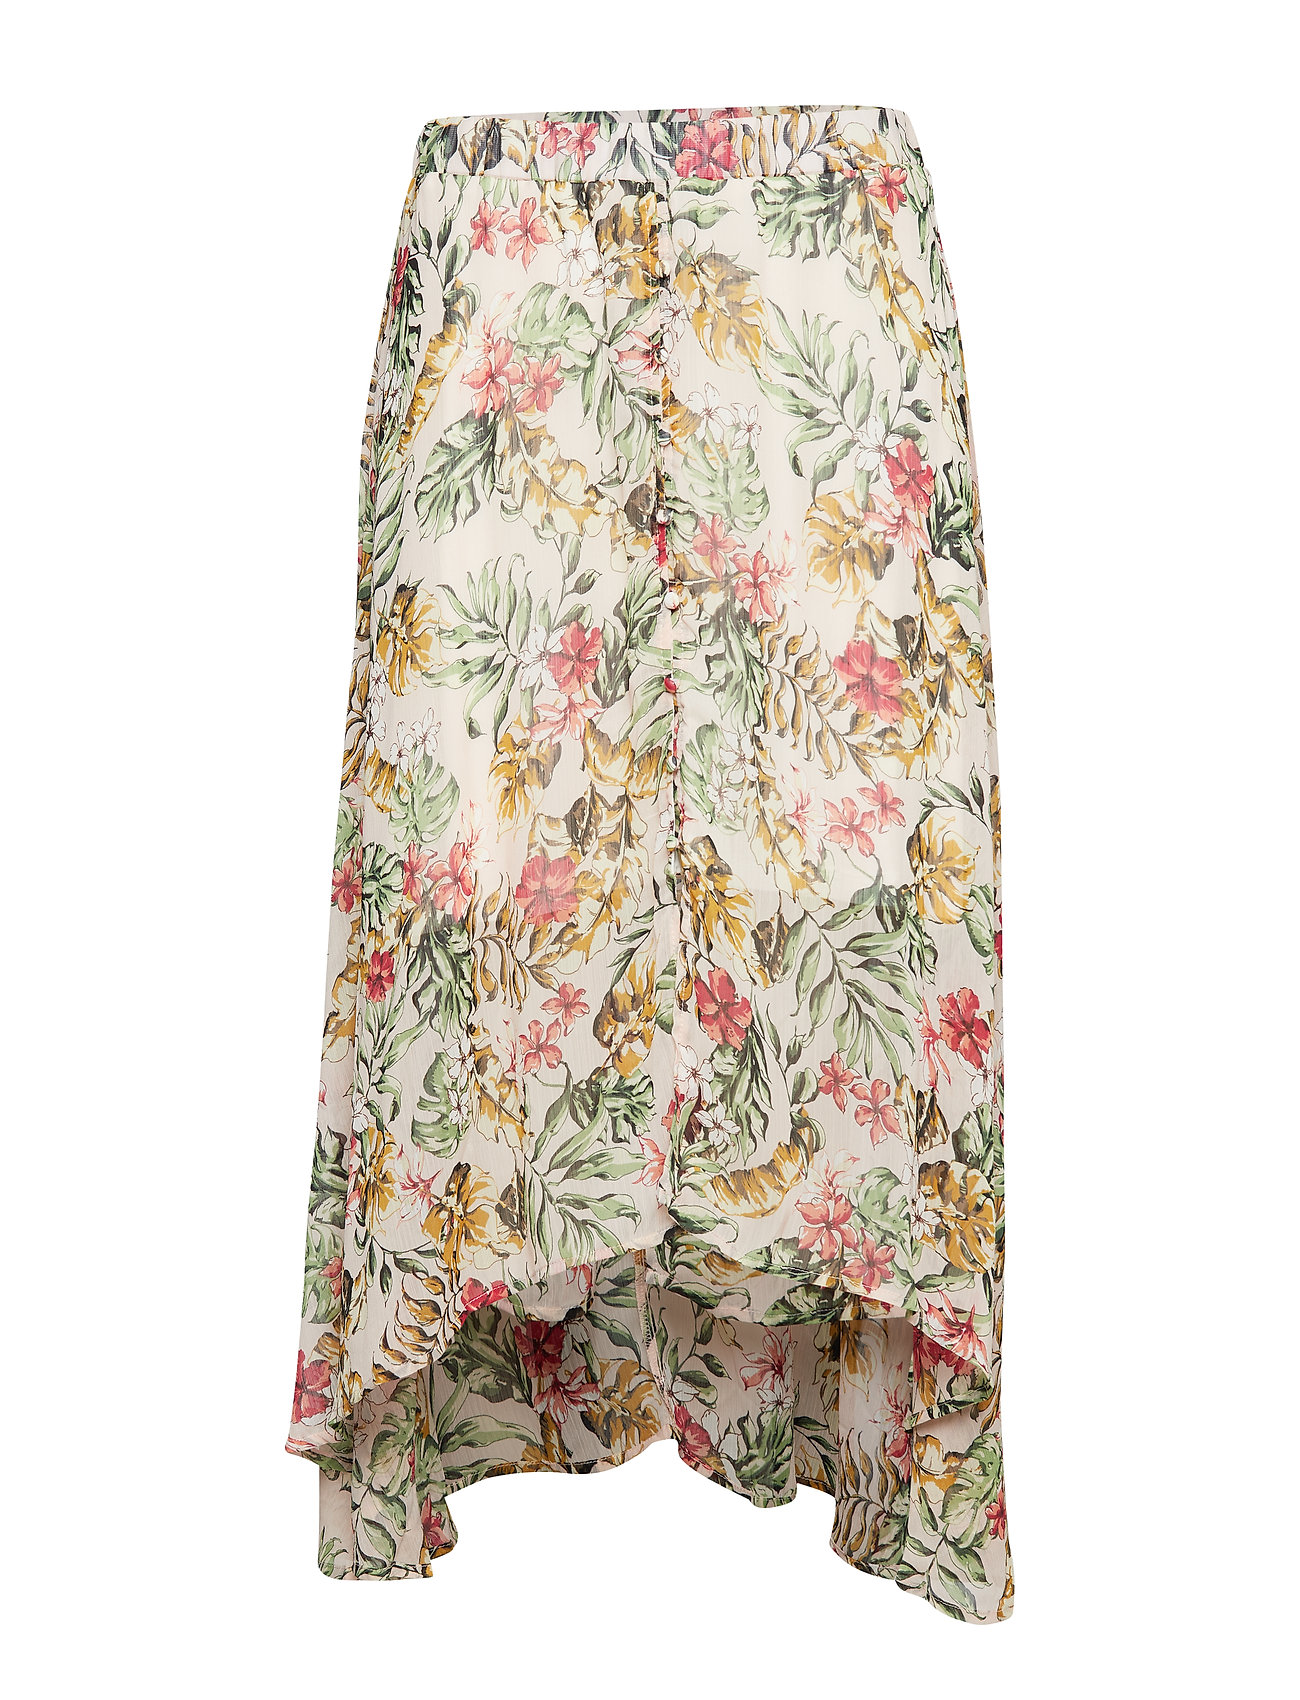 7370678d3b34 Elodie Skirt (Pink Champagne) (639.20 kr) - Cream -   Boozt.com